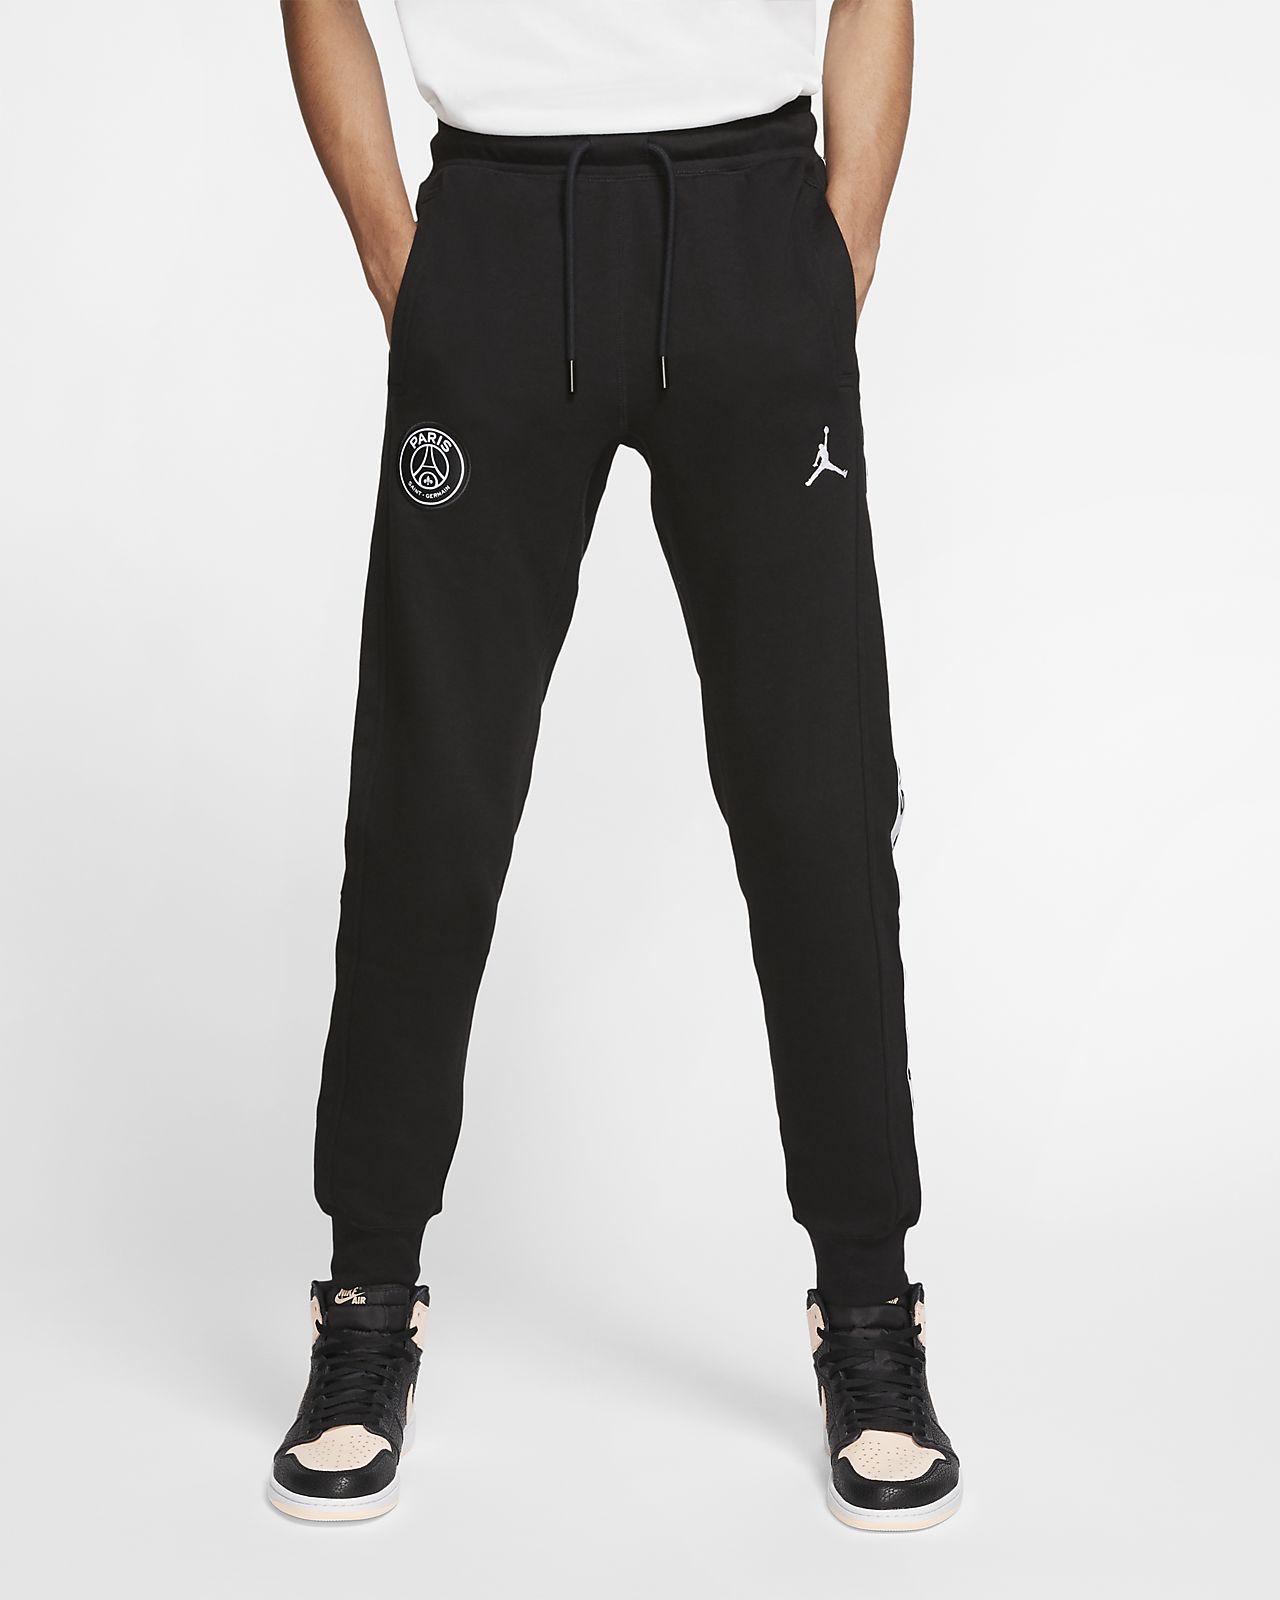 Paris Saint-Germain Fleece Pants